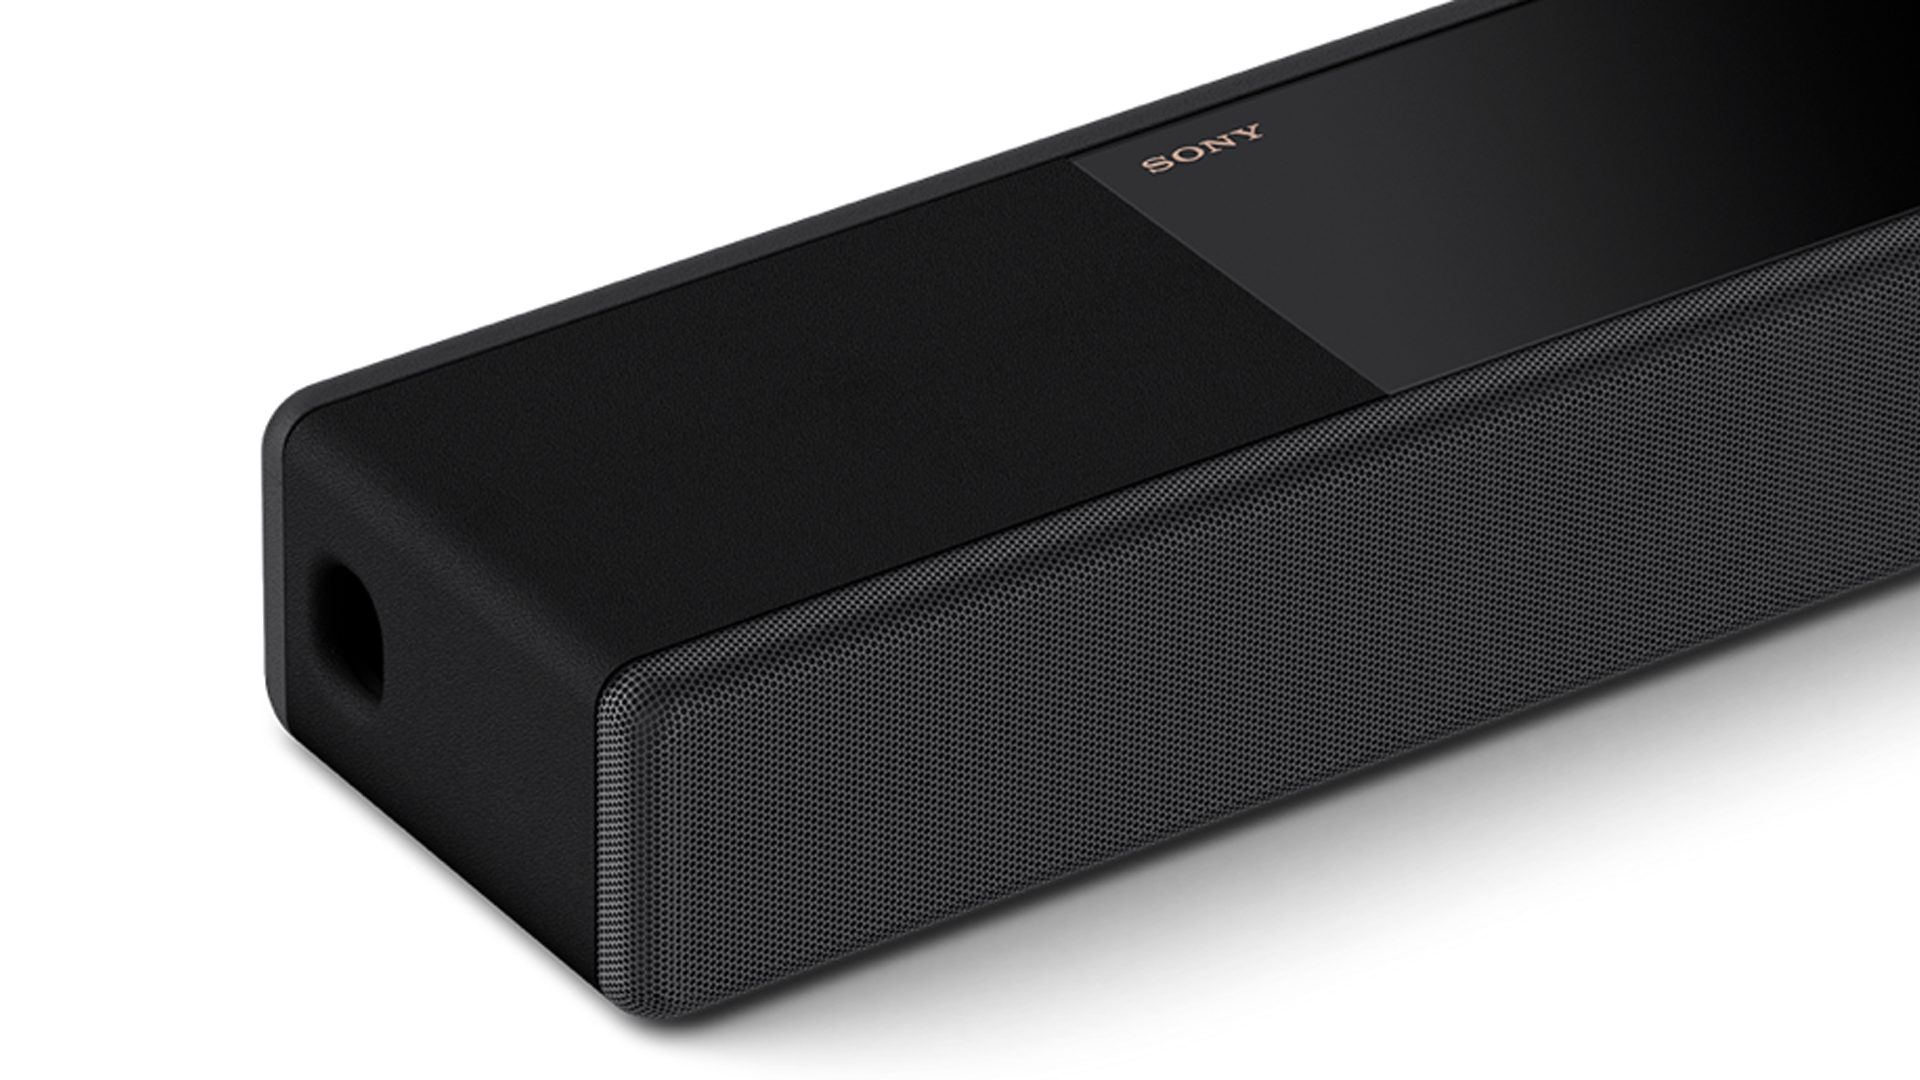 Sony HT-A7000 sound bar